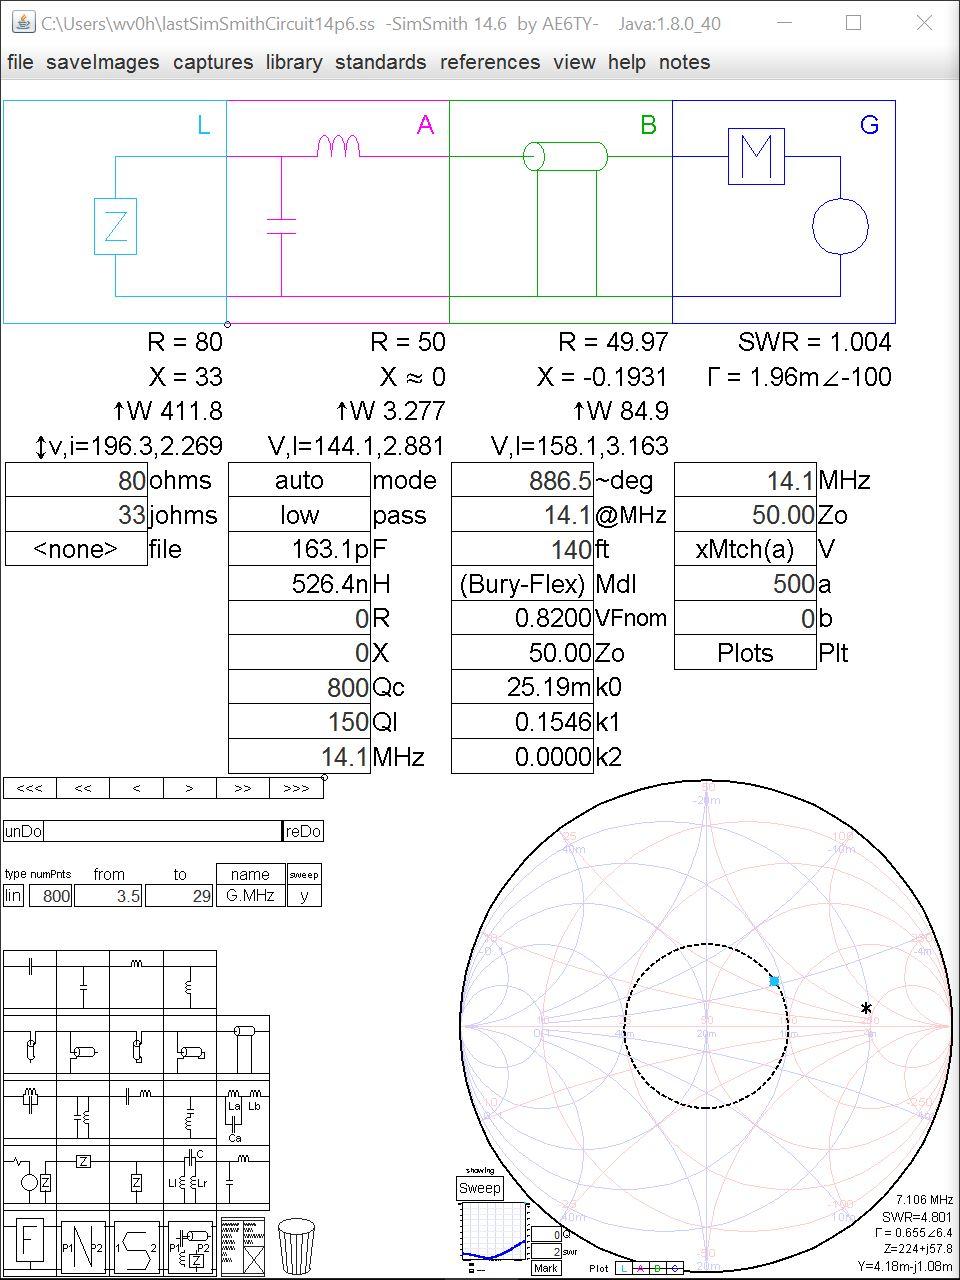 medium resolution of case 1b 2 1 high z 80 j33ohms tuner at antenna